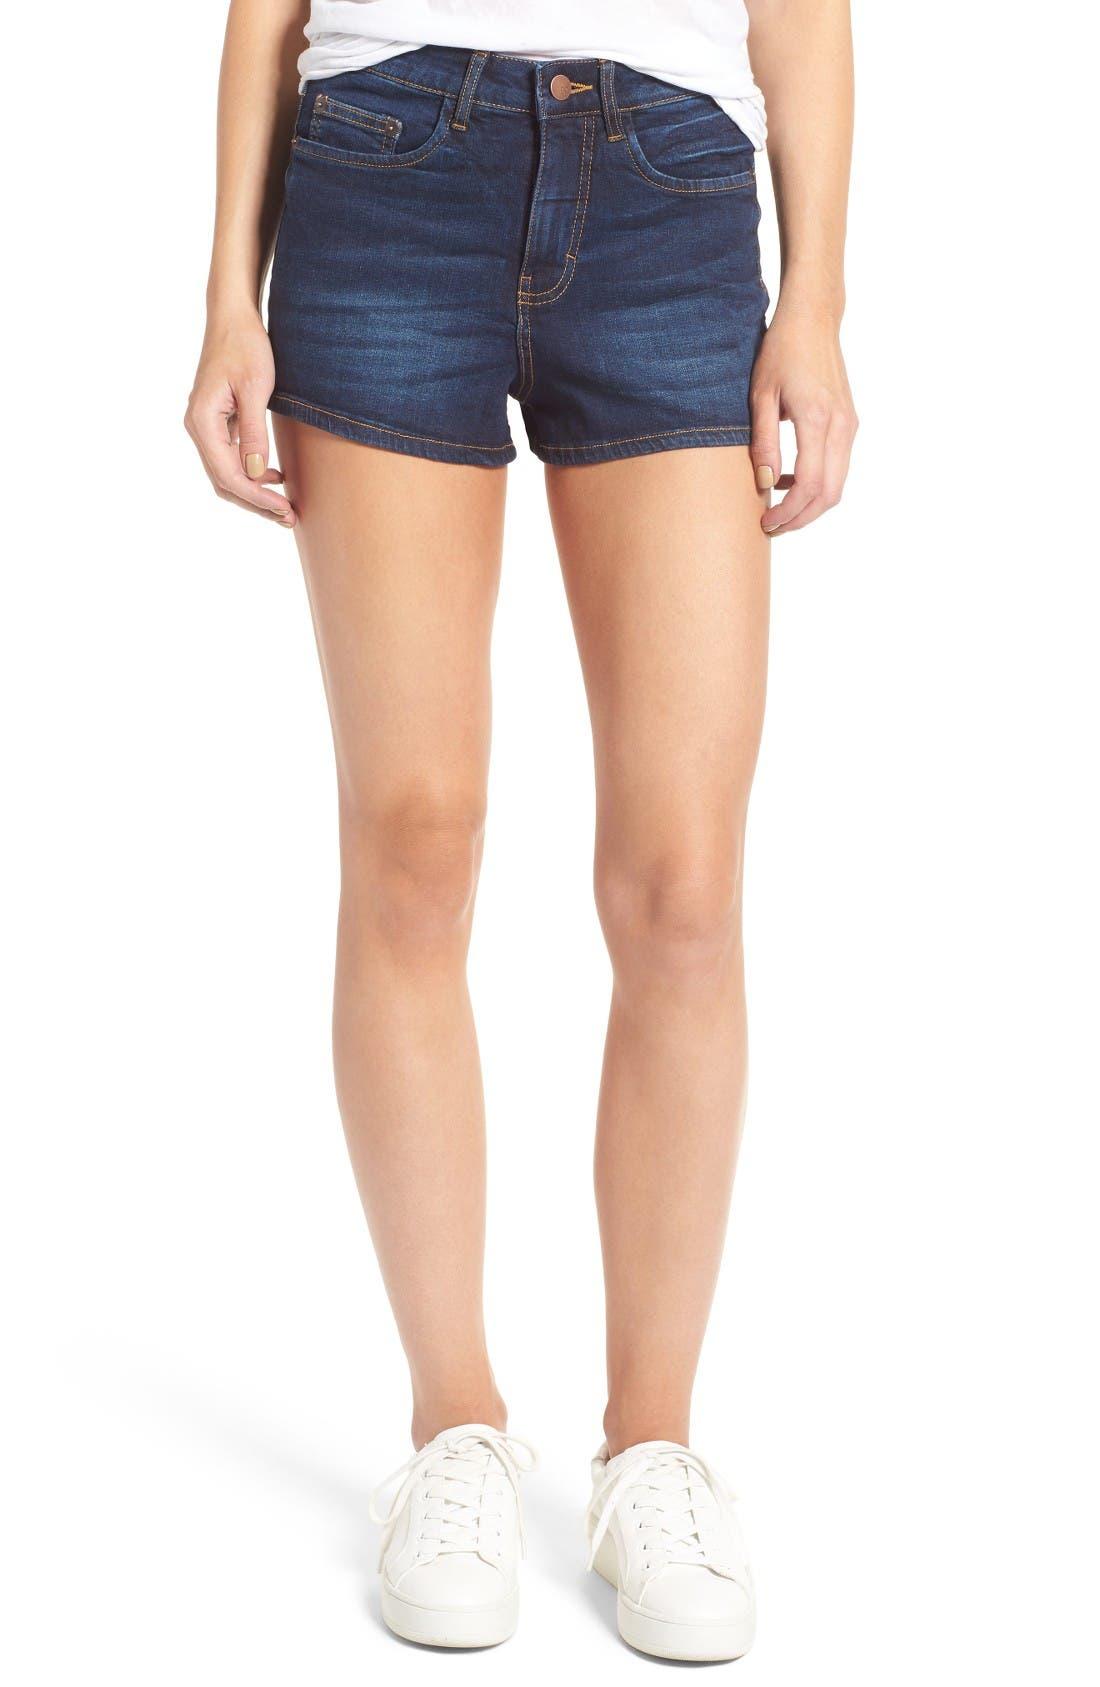 Alternate Image 1 Selected - BP. High Rise Denim Shorts (Deep Sea Blue)